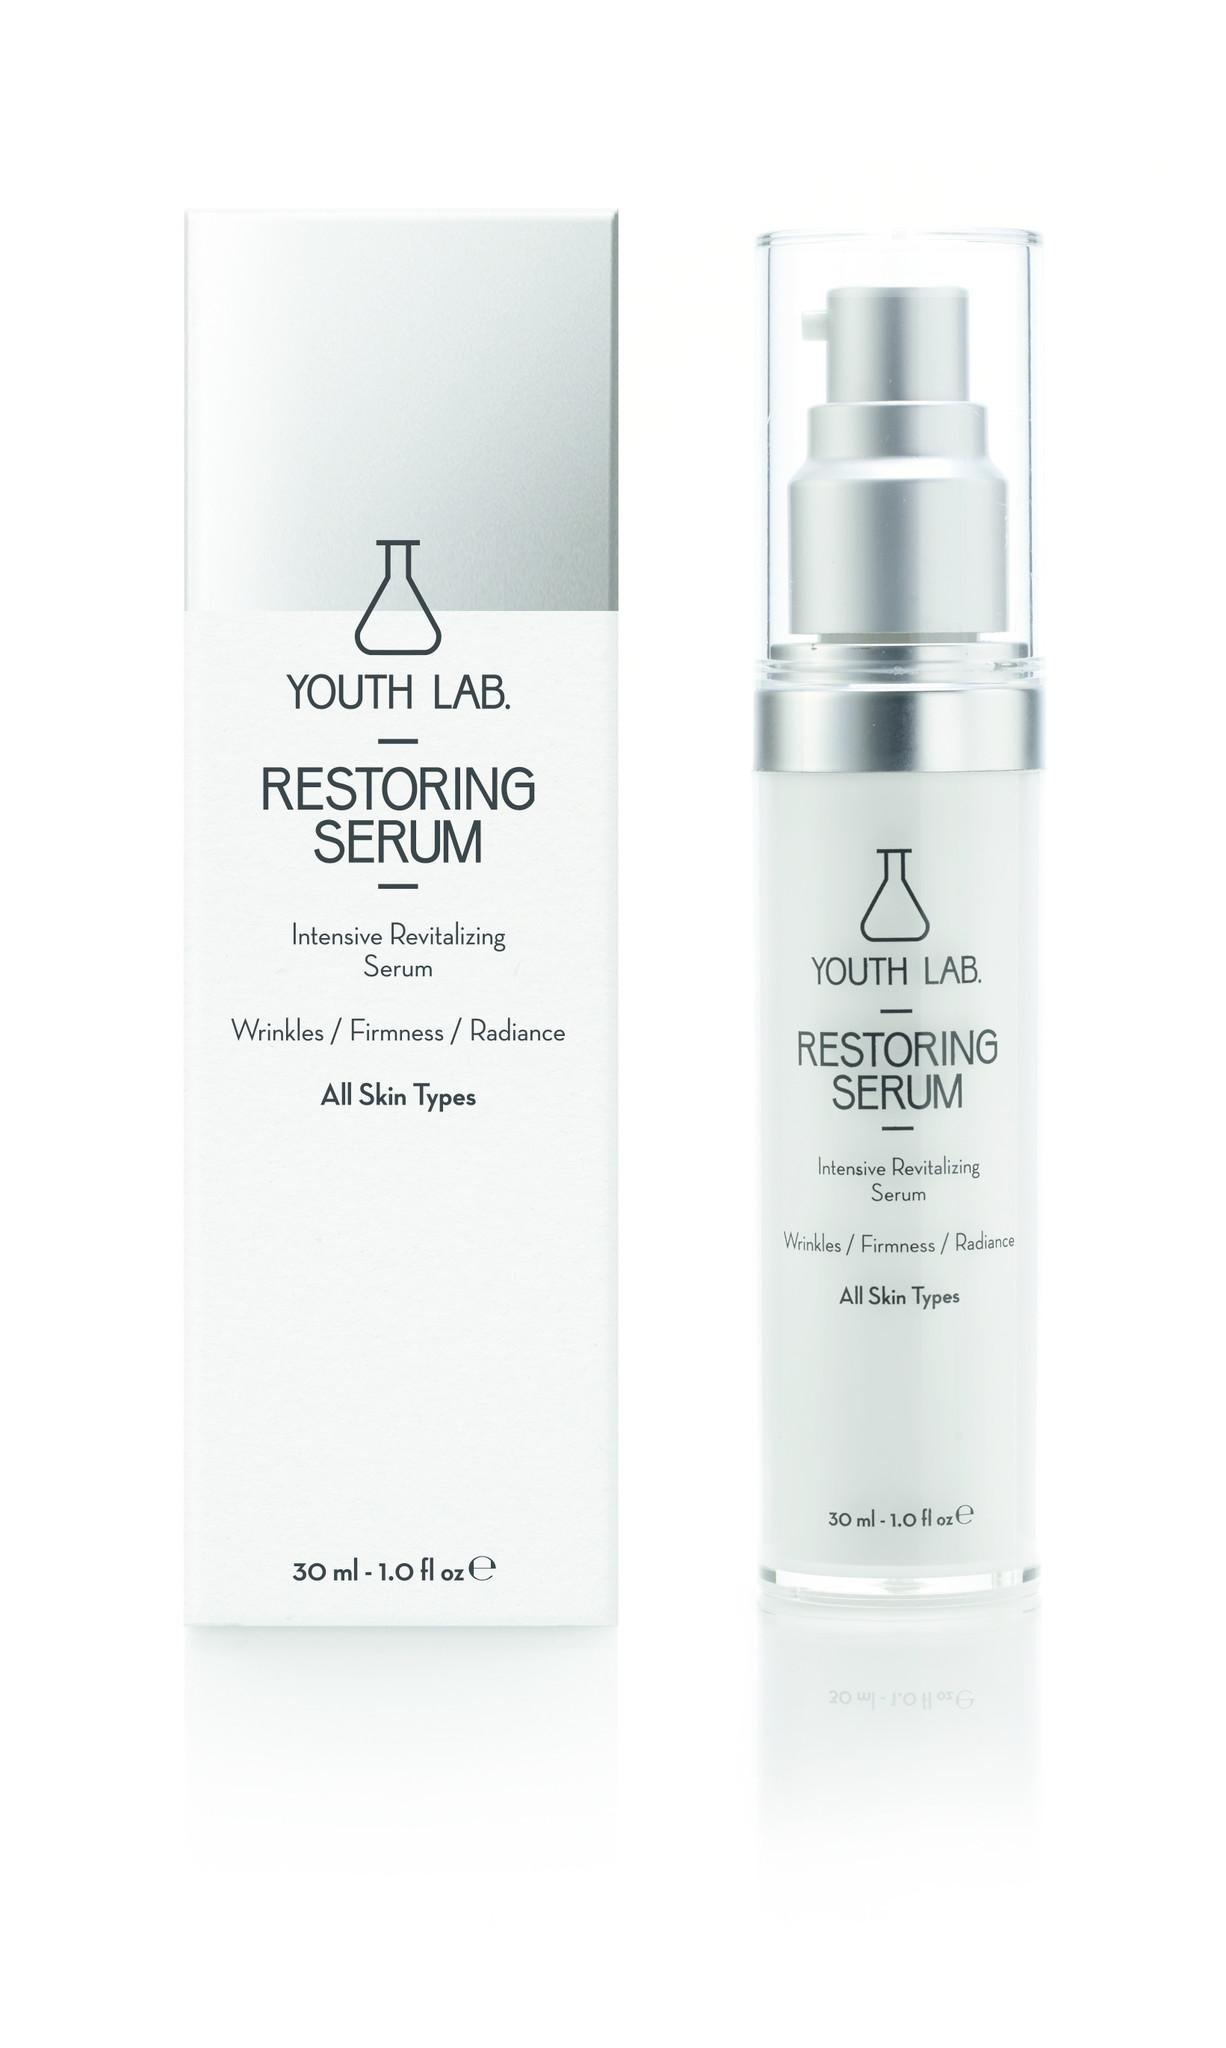 Youth Lab Youth lab Restoring serum 30ml